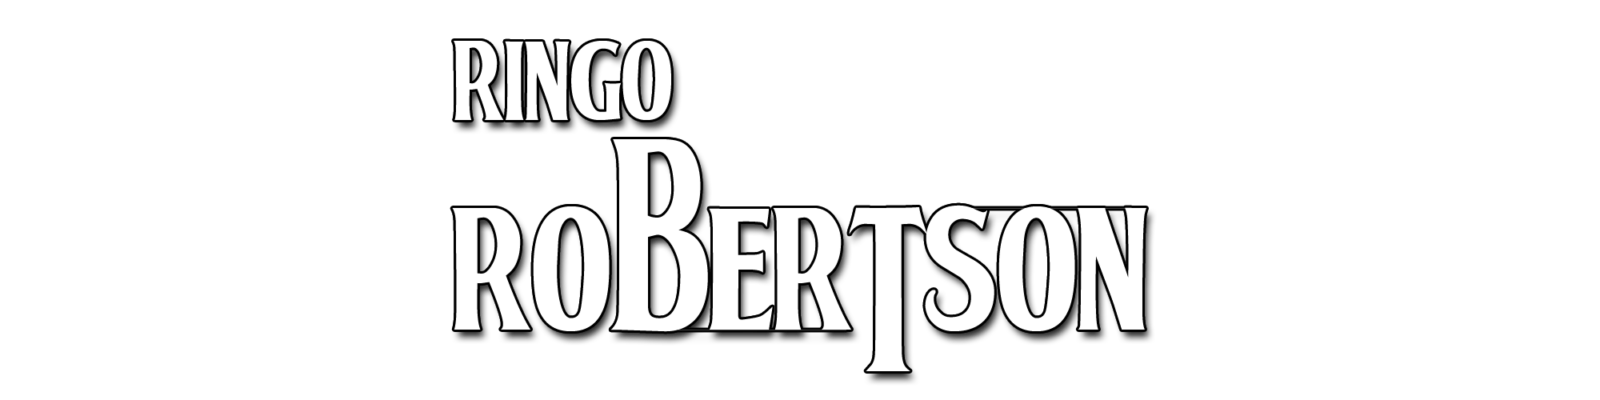 Ringo Robertson Ringo Robertson LOGORINGO 1 1600x400